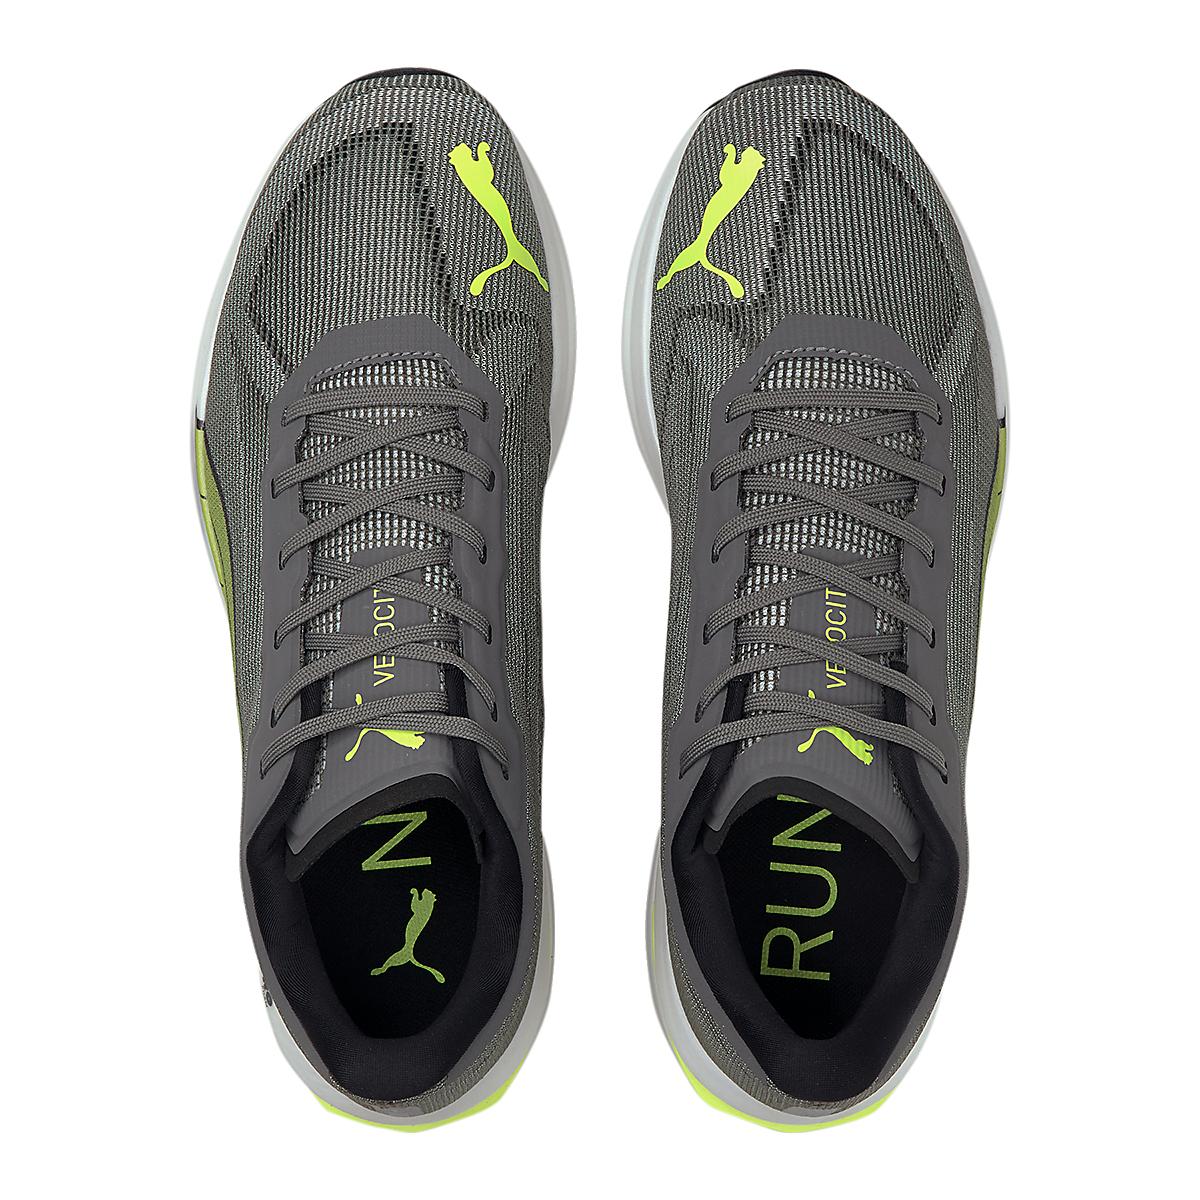 Men's Puma Velocity Nitro Running Shoe - Color: Castlerock-Yellow Alert-Puma Black - Size: 7 - Width: Regular, Castlerock-Yellow Alert-Puma Black, large, image 4